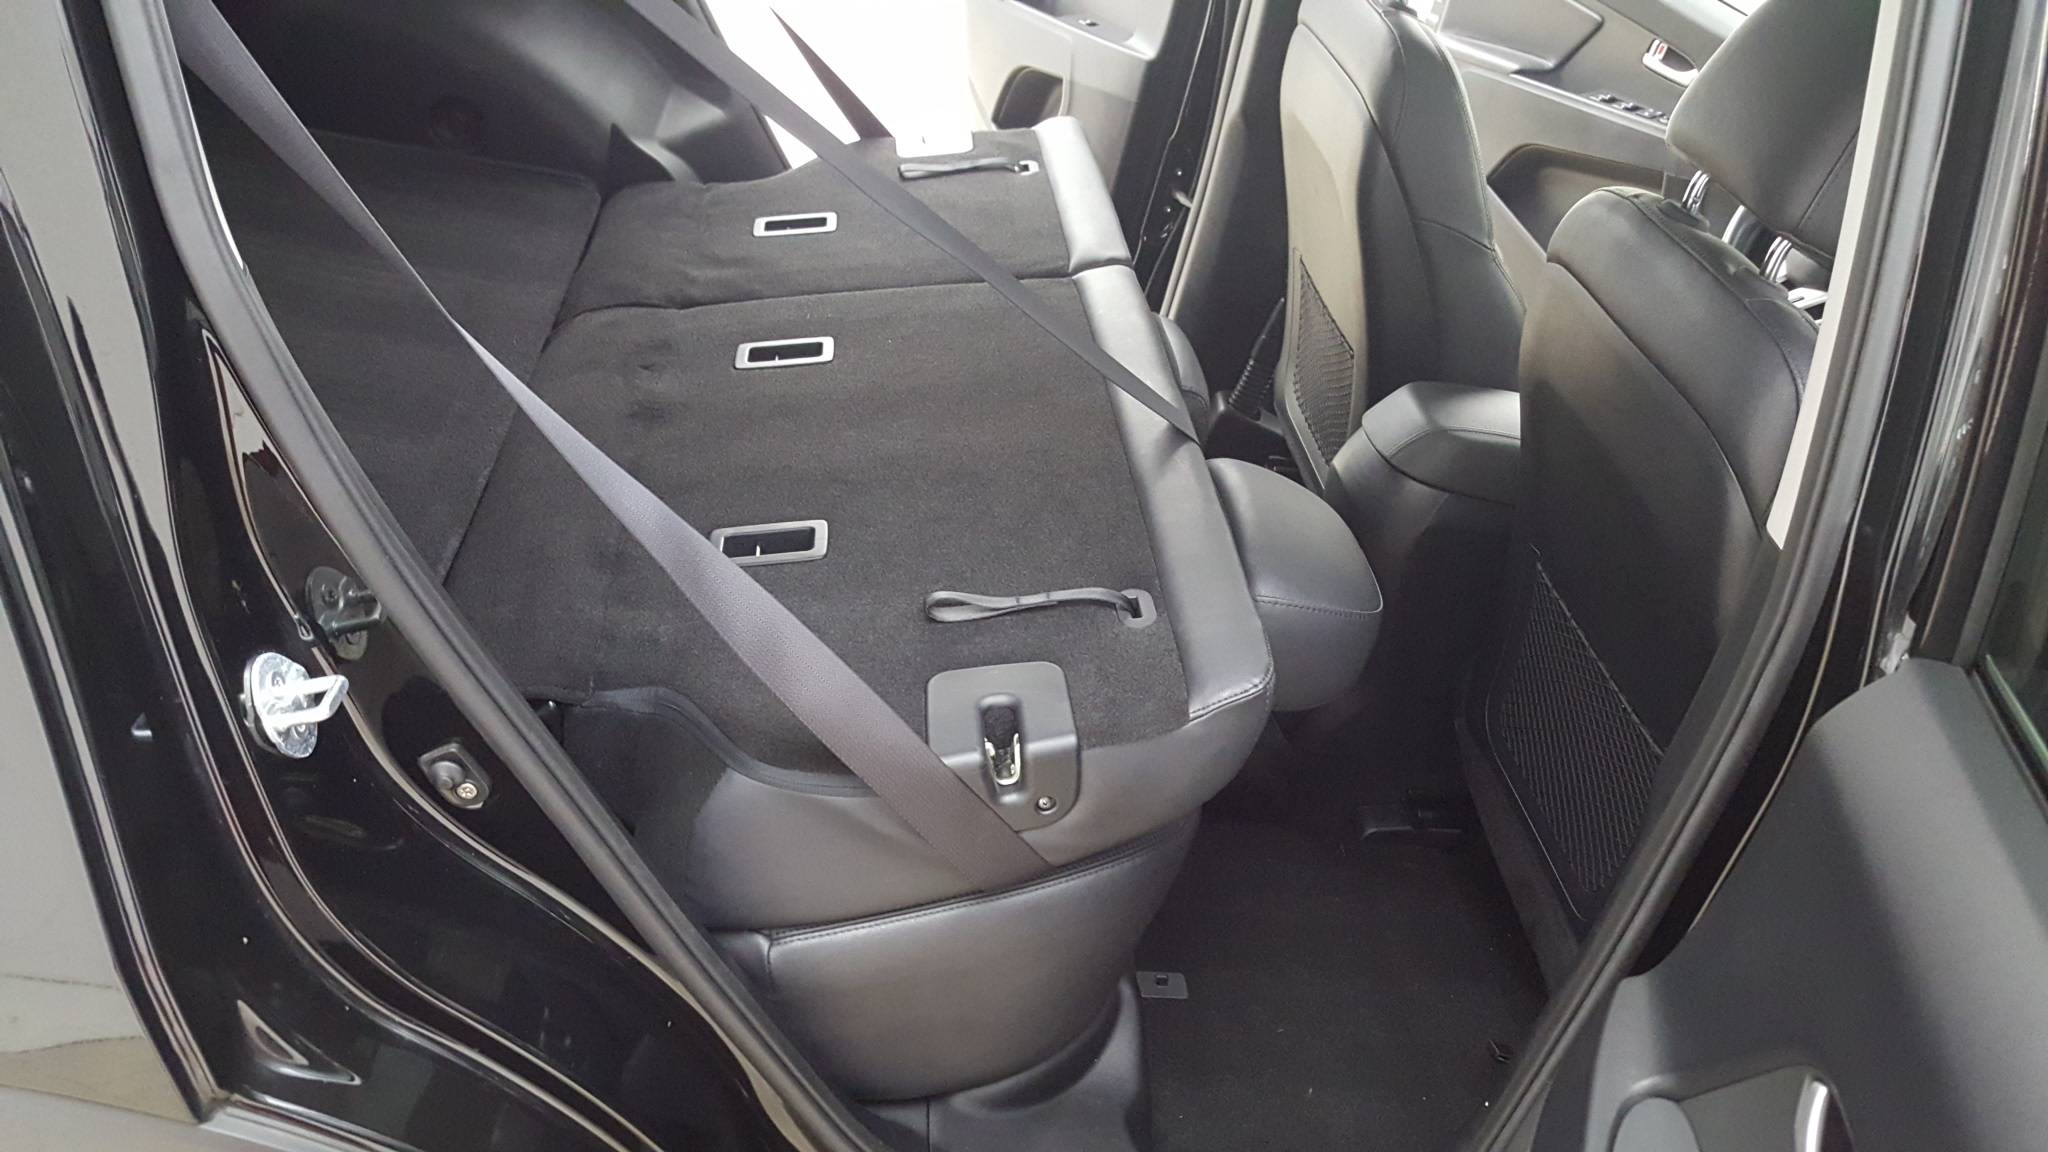 Pre-Owned 2013 Kia Sportage EX